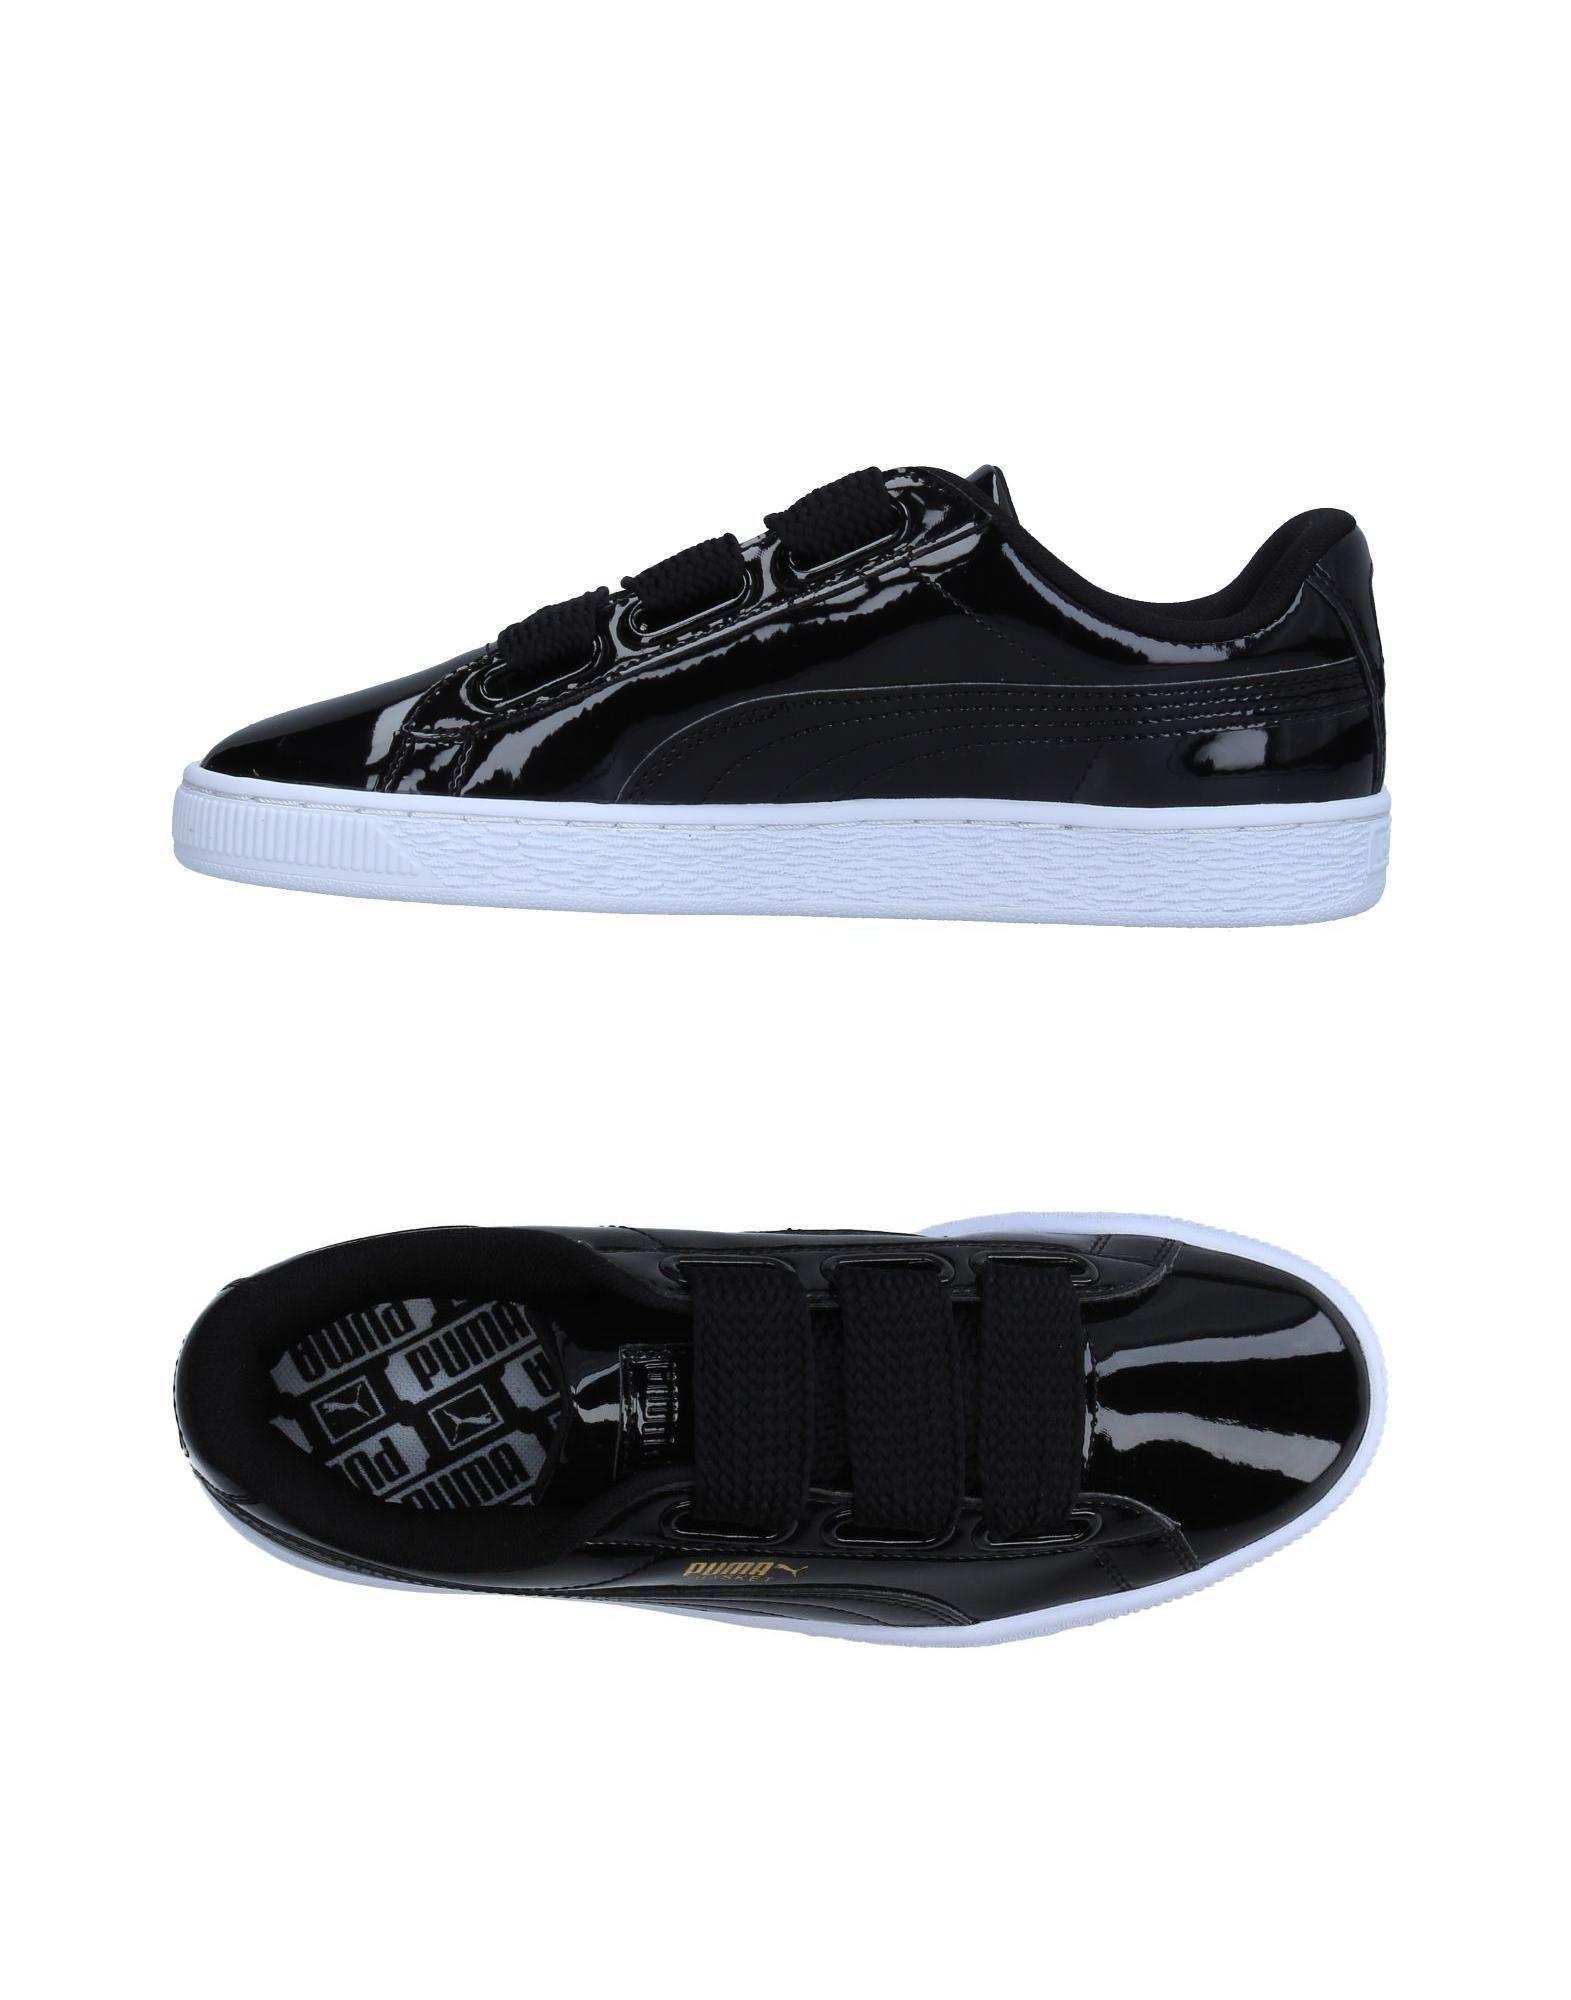 Haltbare Mode billige Schuhe Puma Sneakers Damen  11326413AL Heiße Schuhe